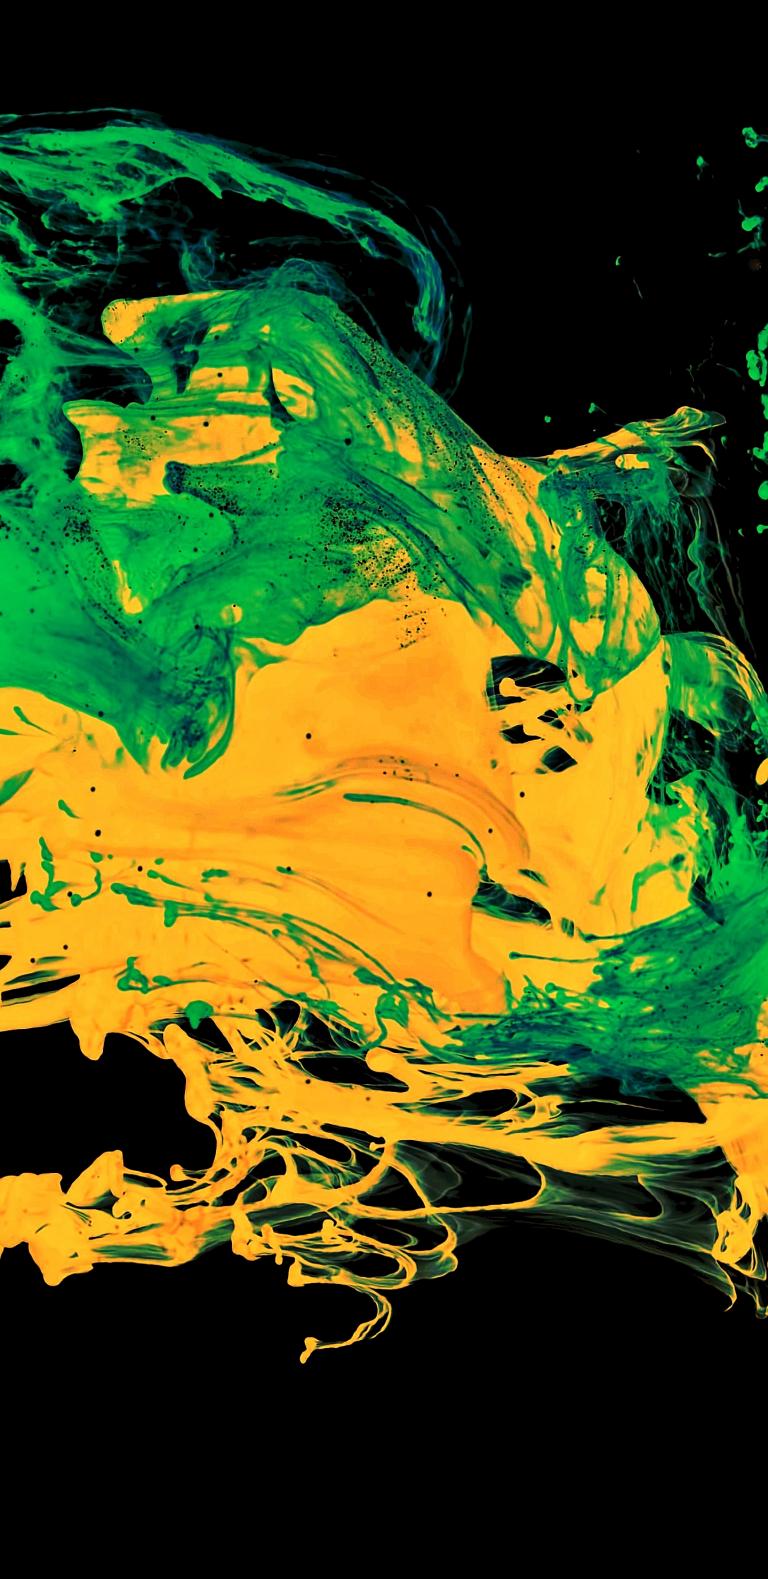 Oled Iphone 11 Pro Green Wallpaper Idownloadblog Paint Splatter 768x1579 Sfondo Iphone Sfondi Iphone Sfondi